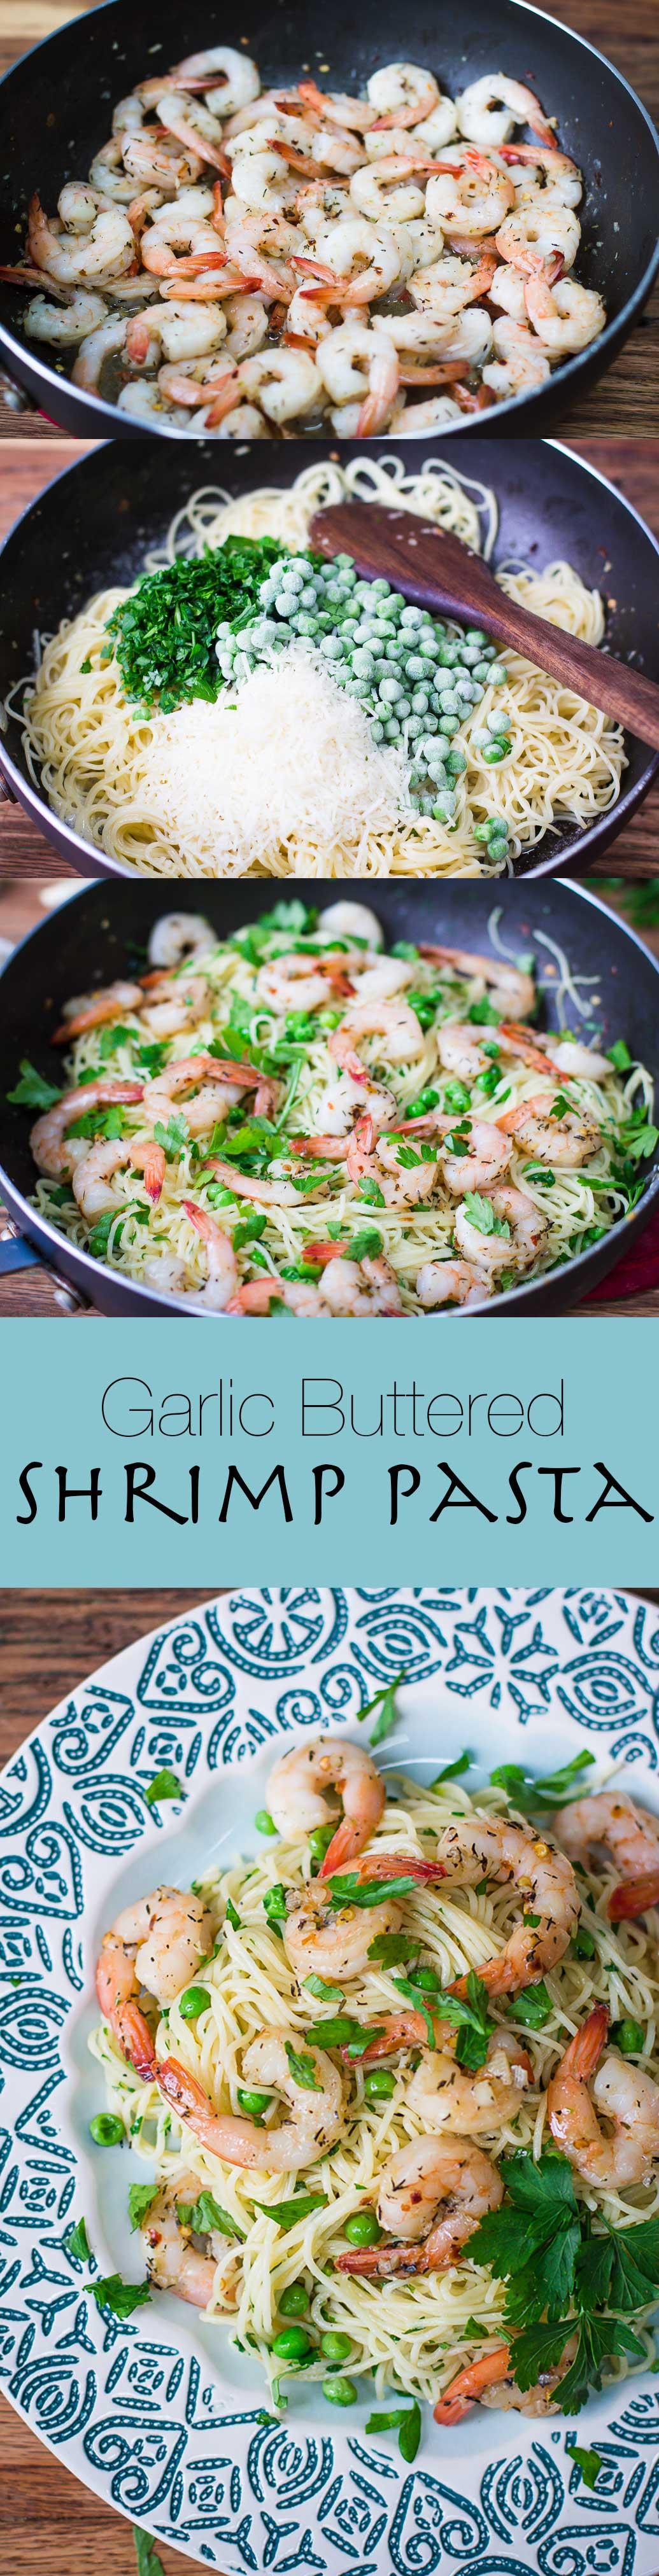 garlic-buttered-shrimp-pasta